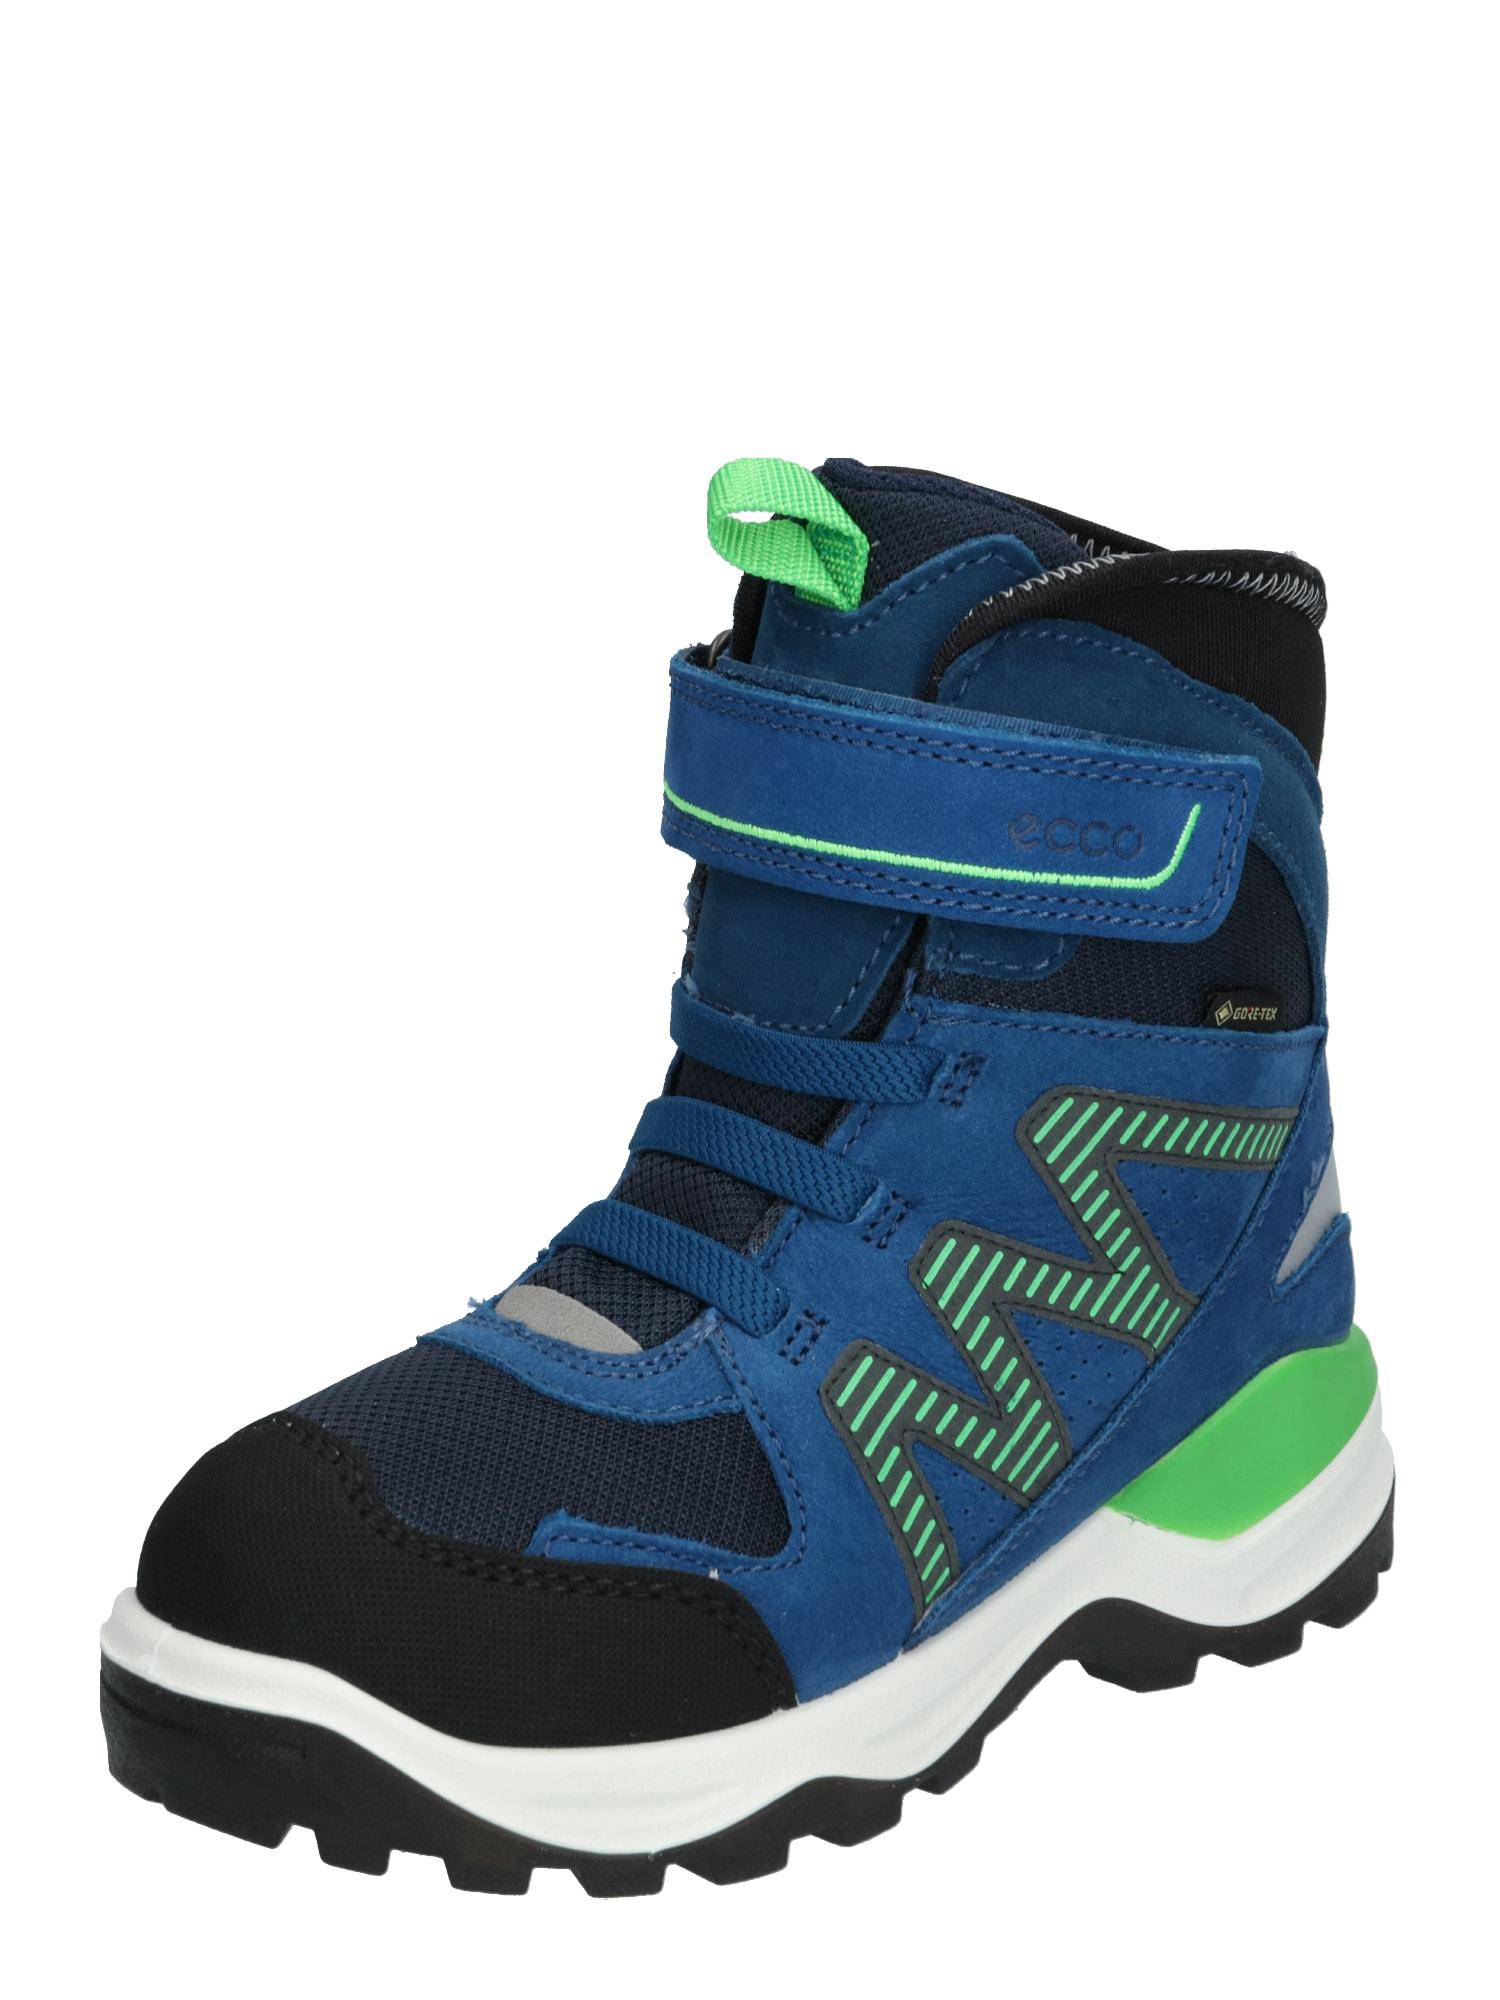 ECCO Atviri batai 'Snow Mountain BlackPoseidonPoseidon' mėlyna